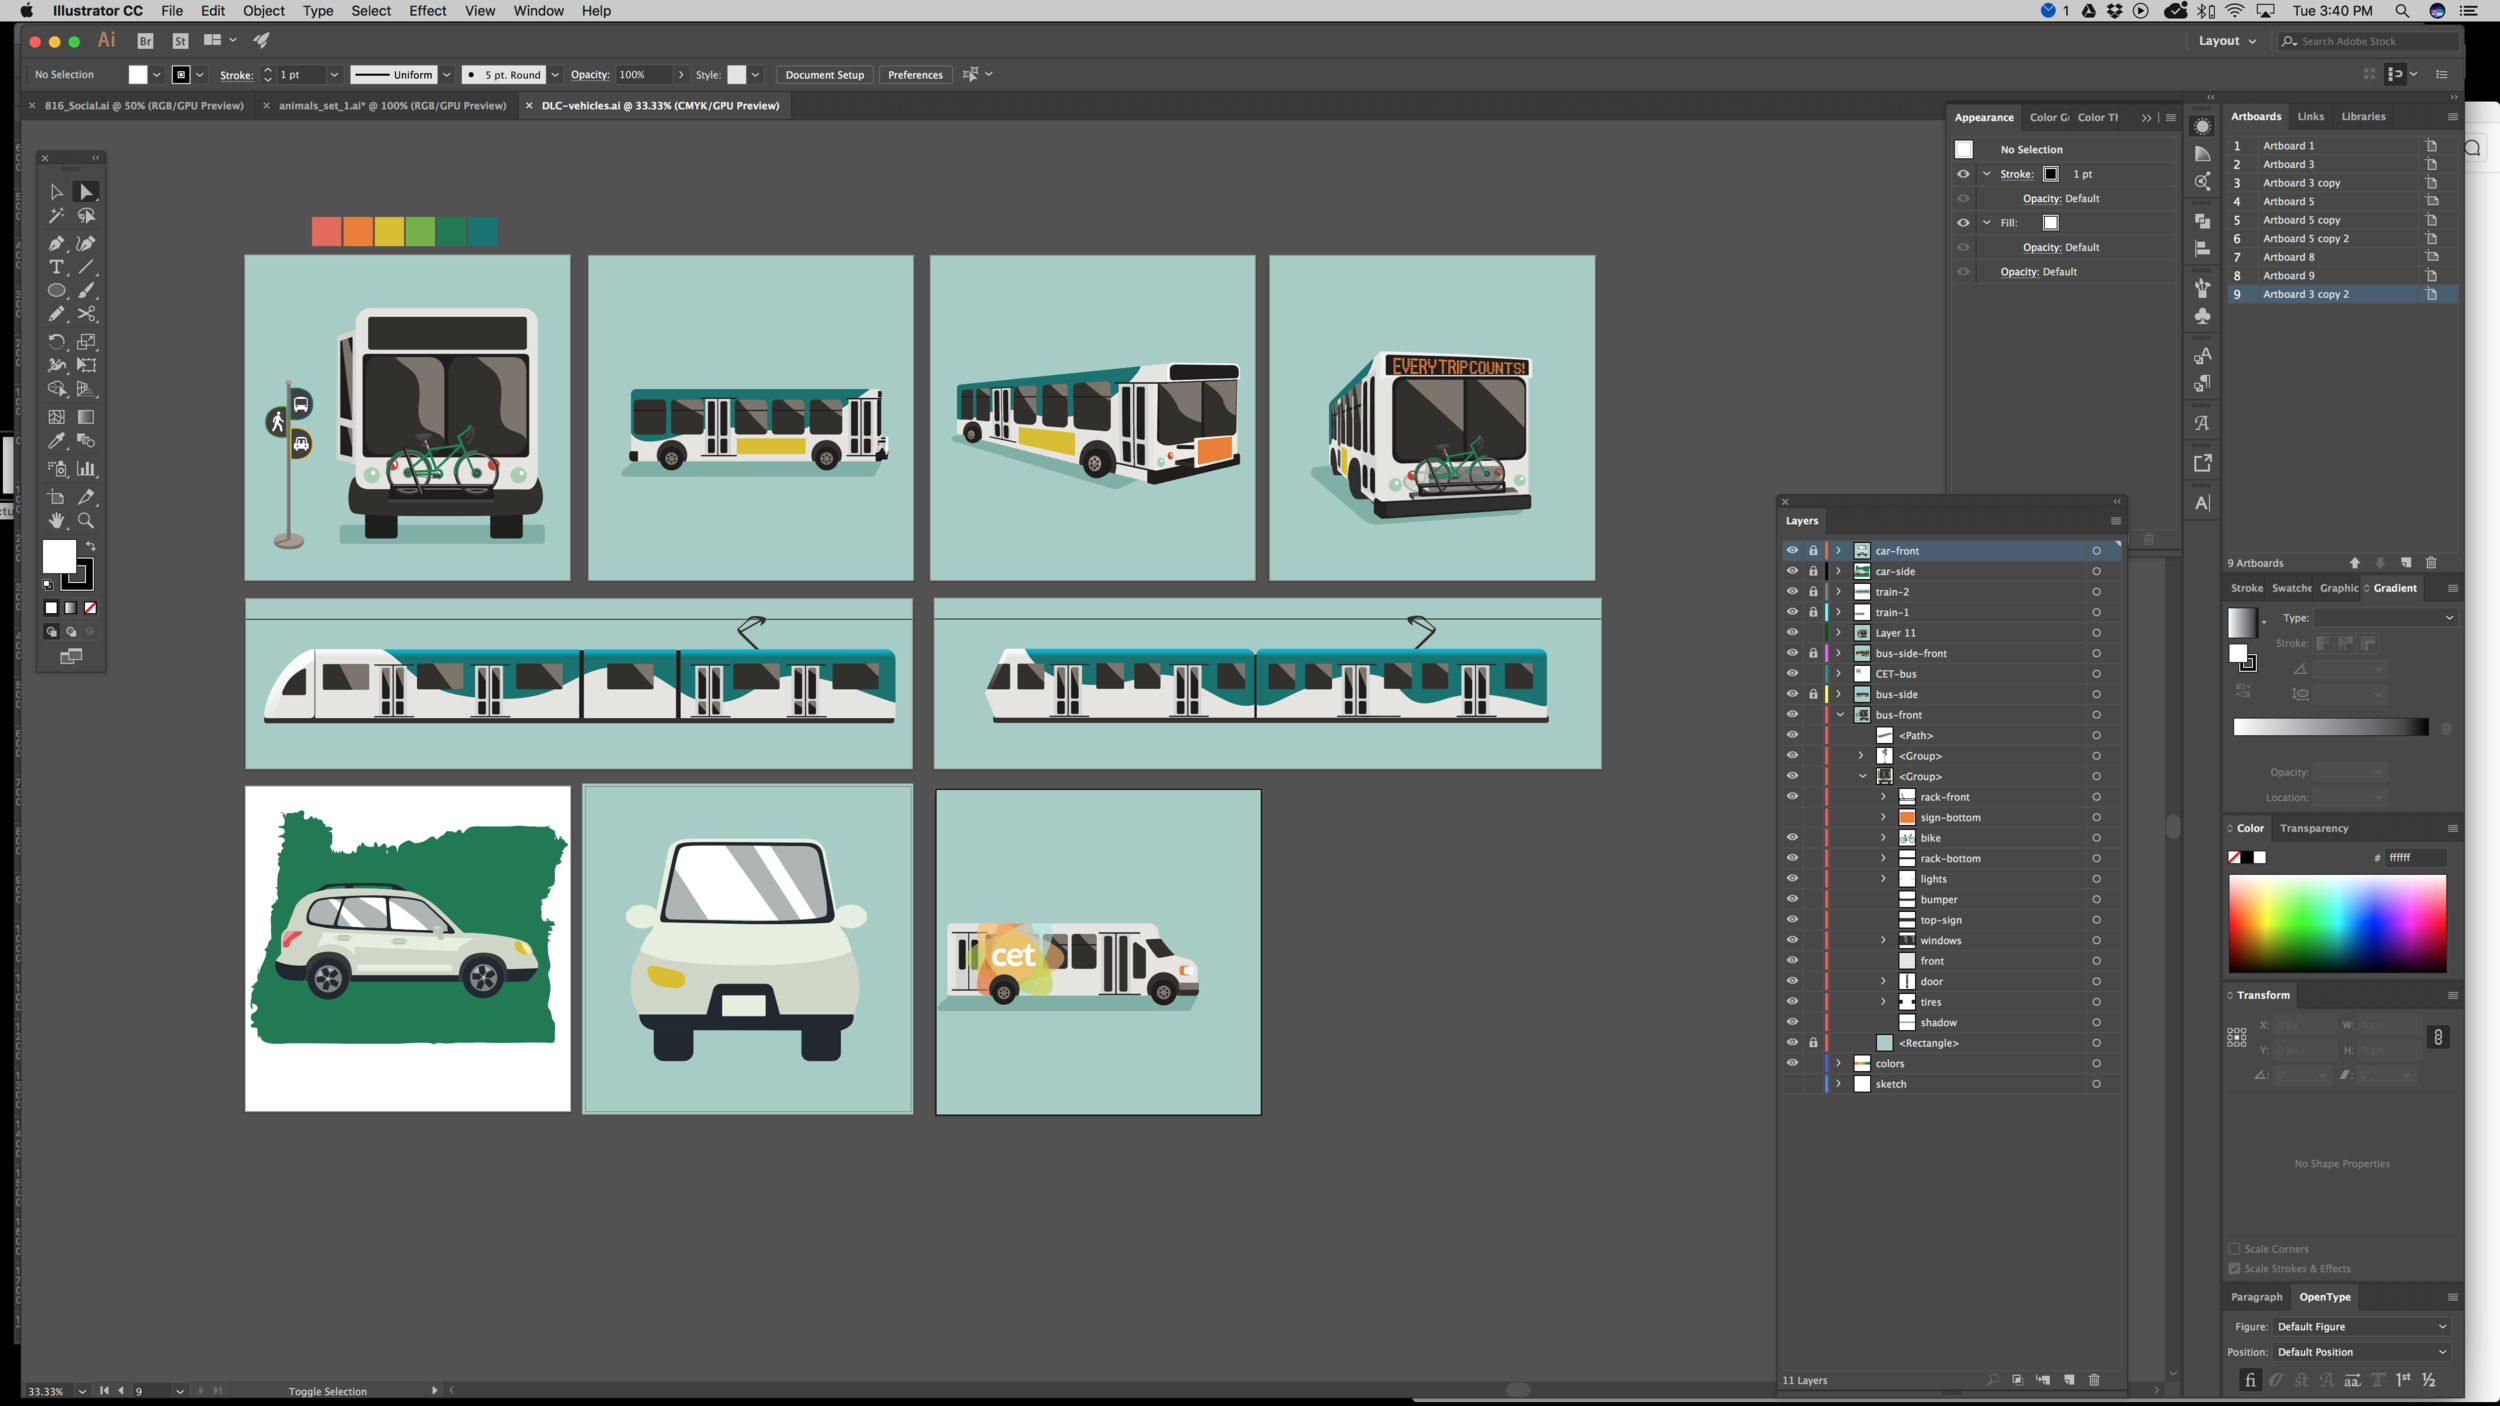 public transportation and carpooling graphics in progress